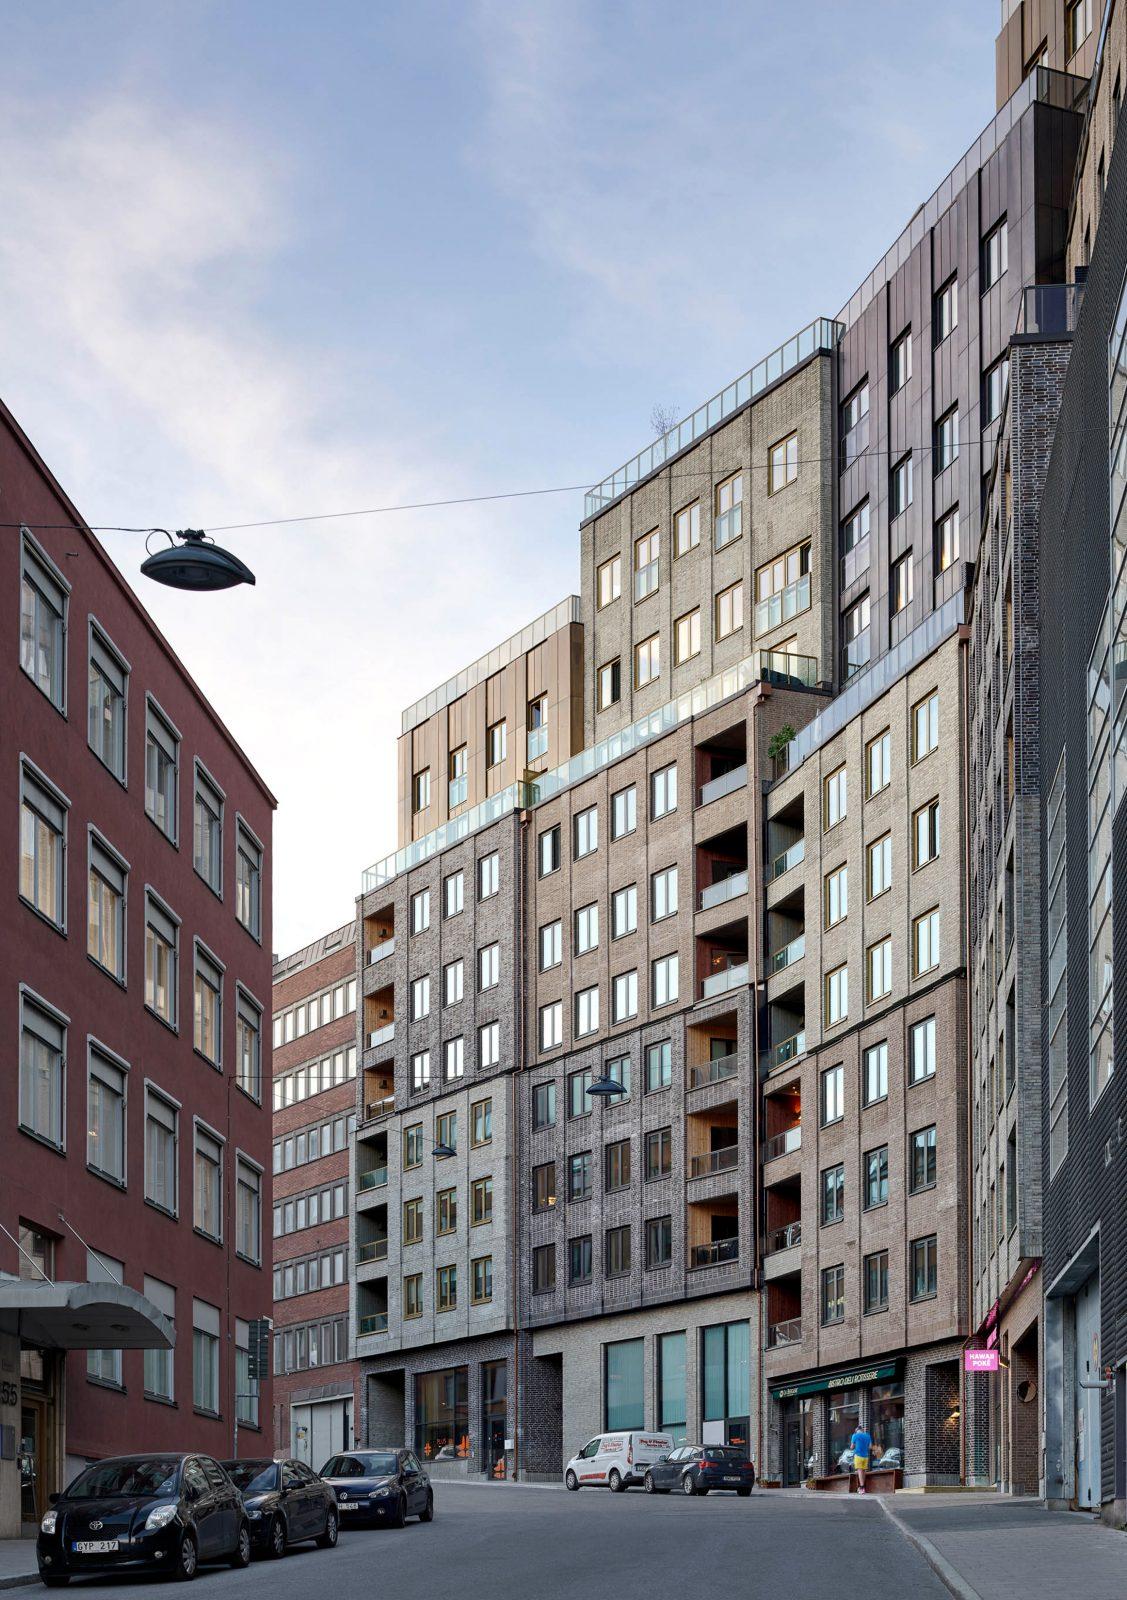 KjellanderSjoberg Etaget AdamMork Streetview-02 2324x3300